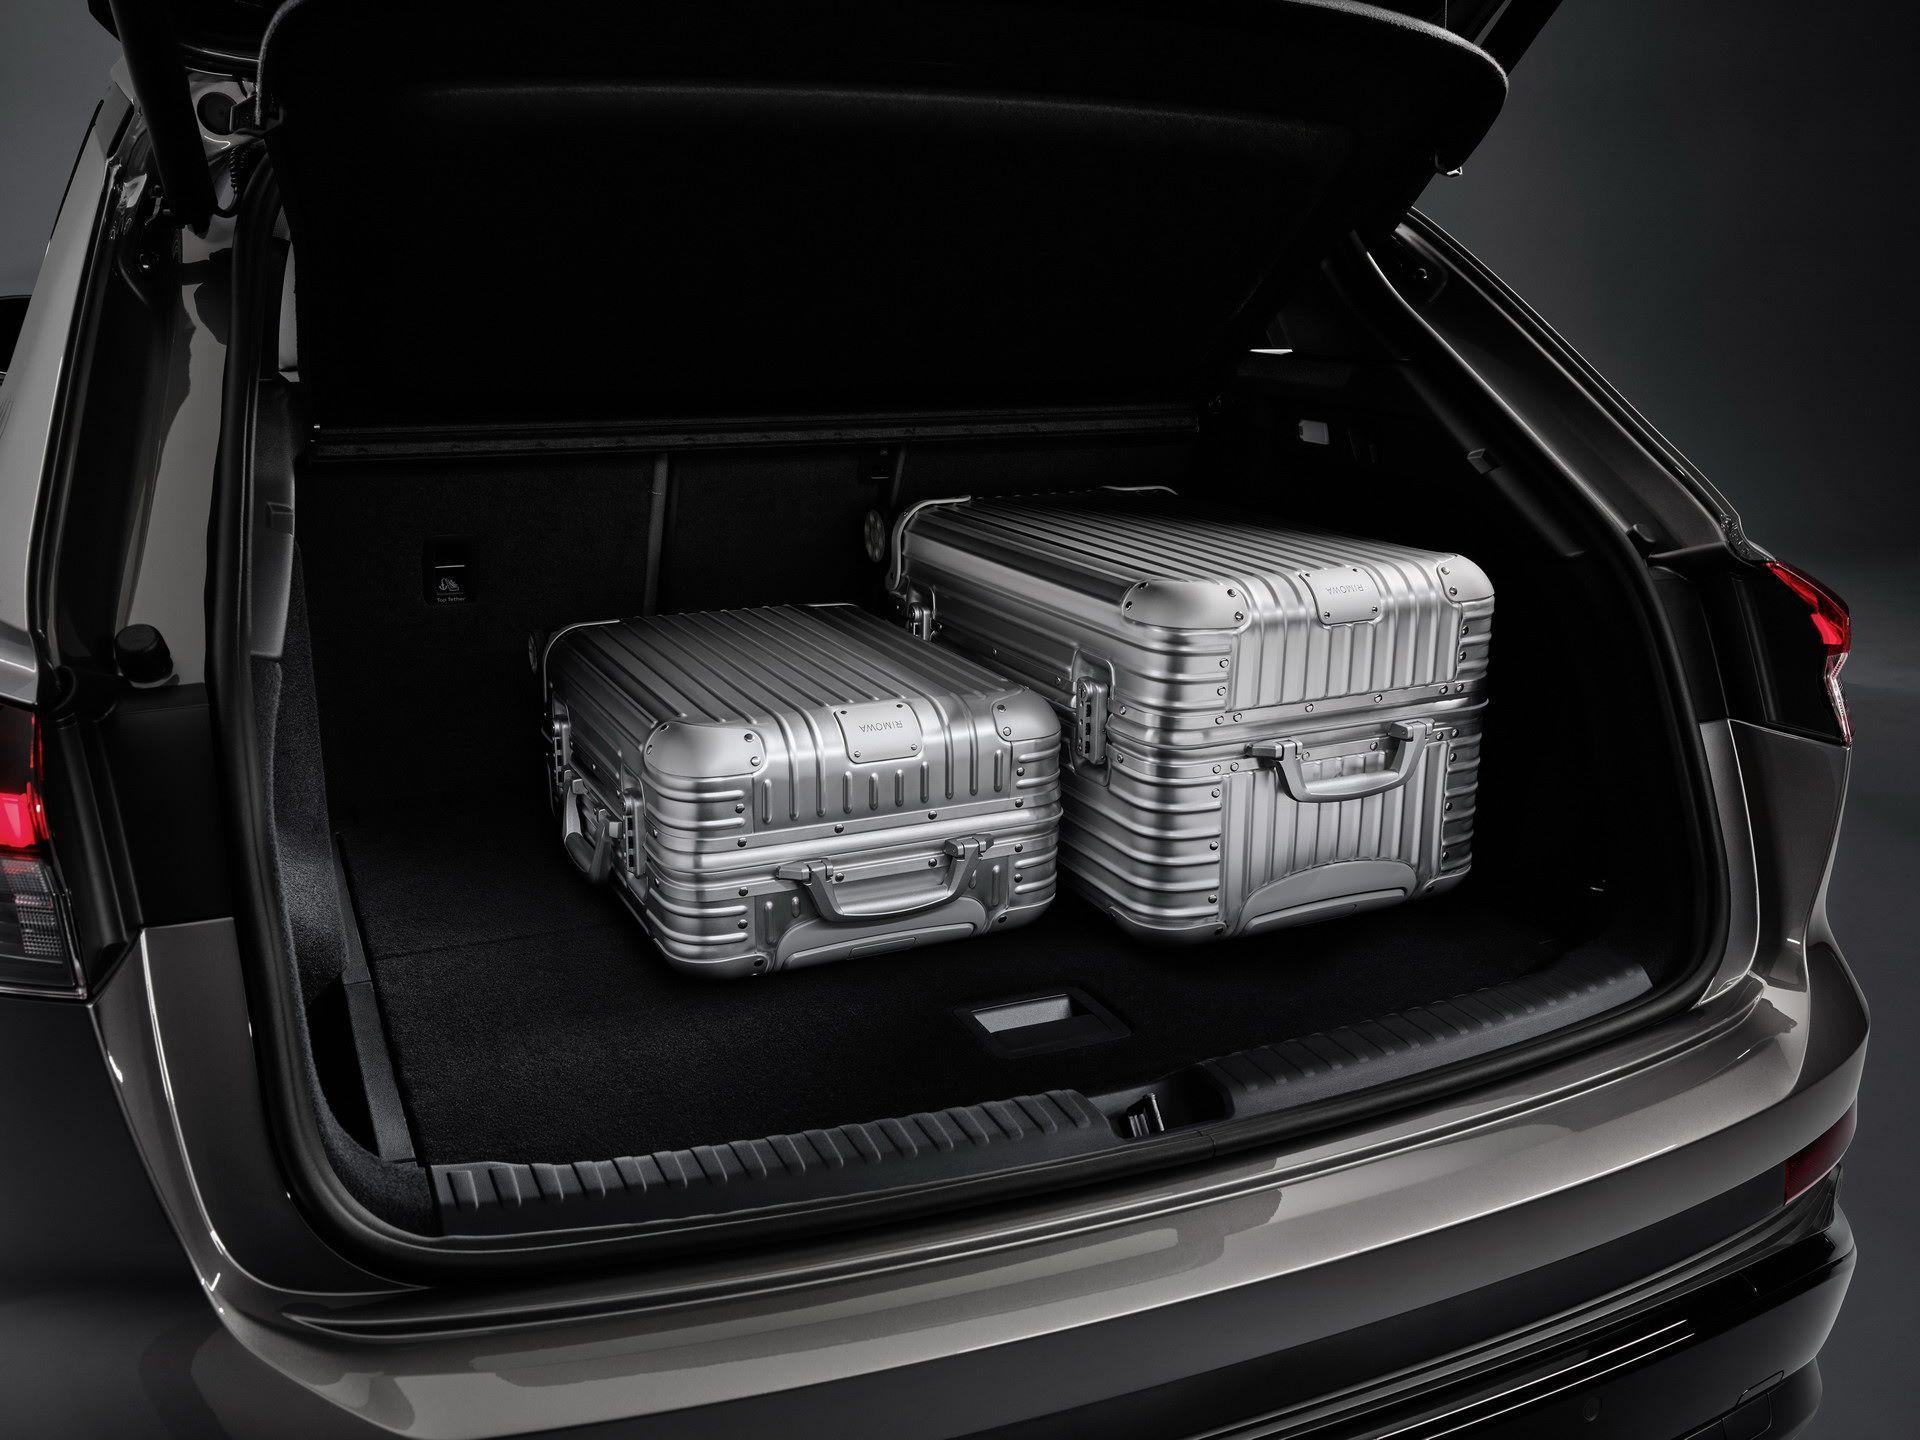 Audi-Q4-e-tron-and-Q4-e-tron-Sportback-75